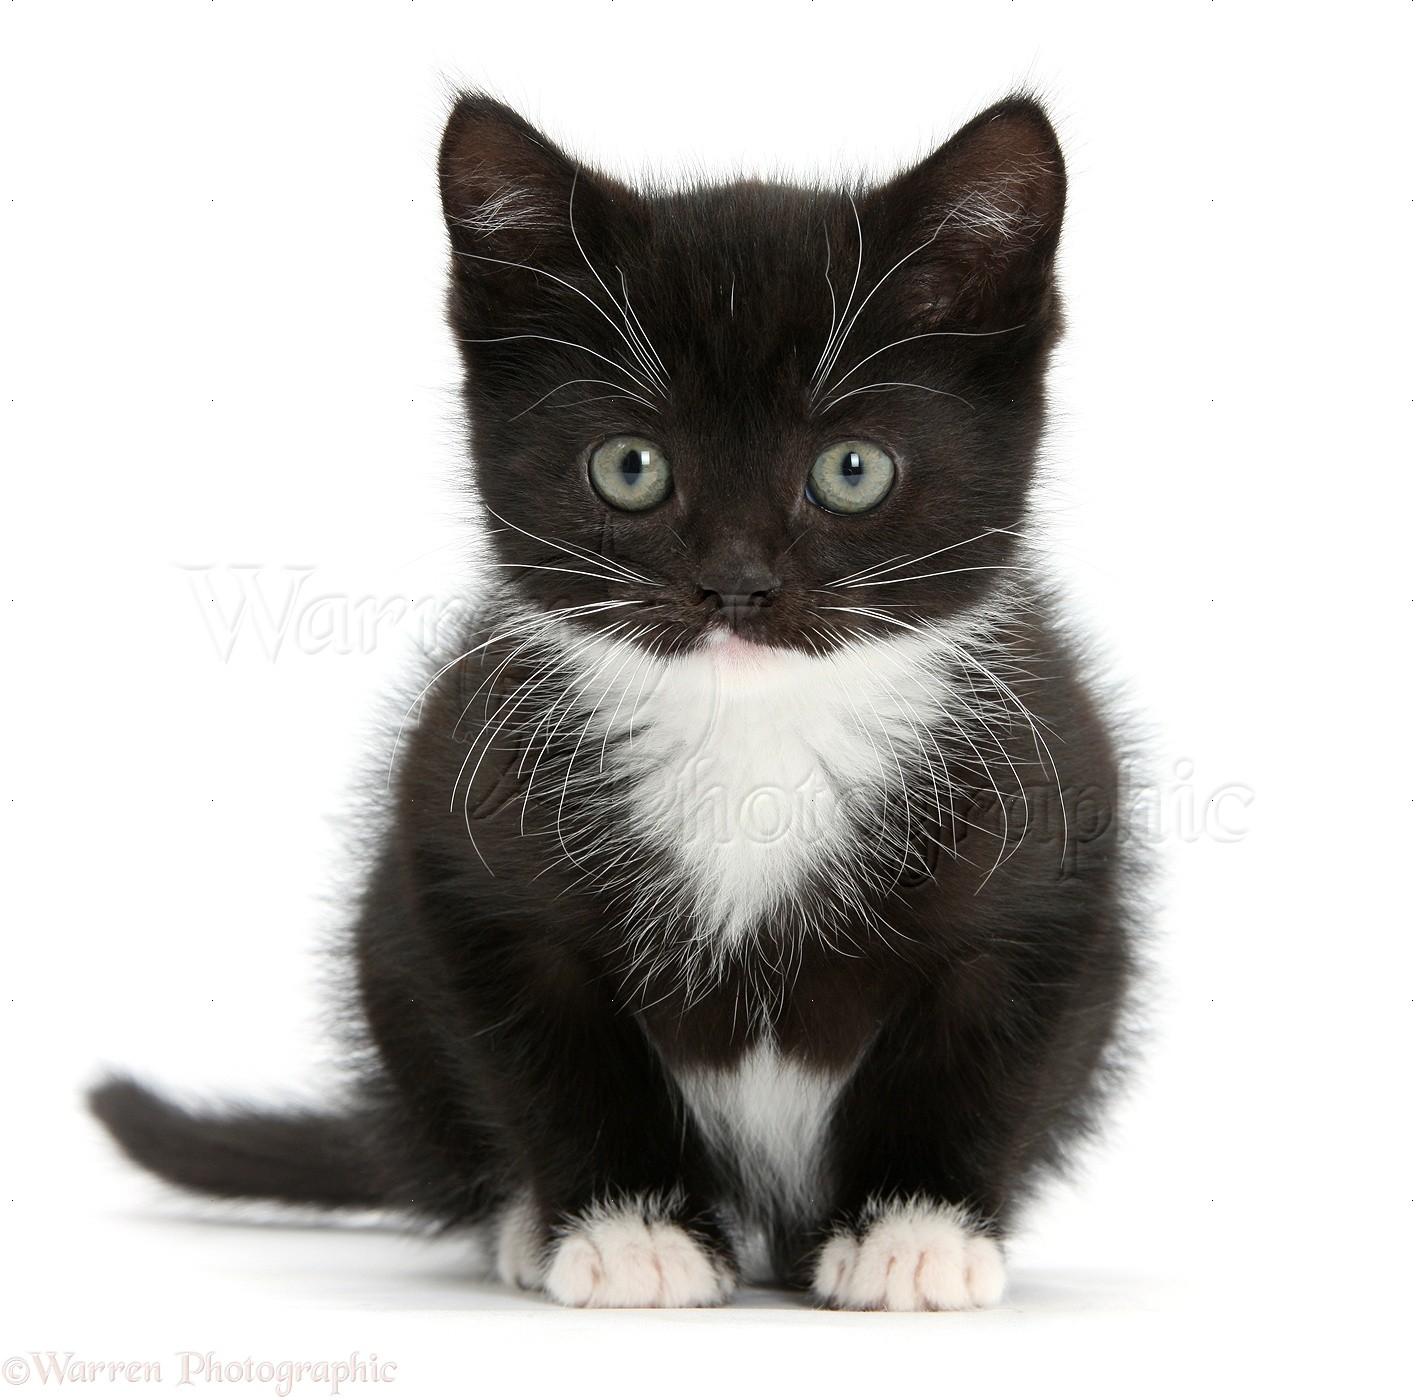 kitten sitting kittens cats photographic cat fluffy background